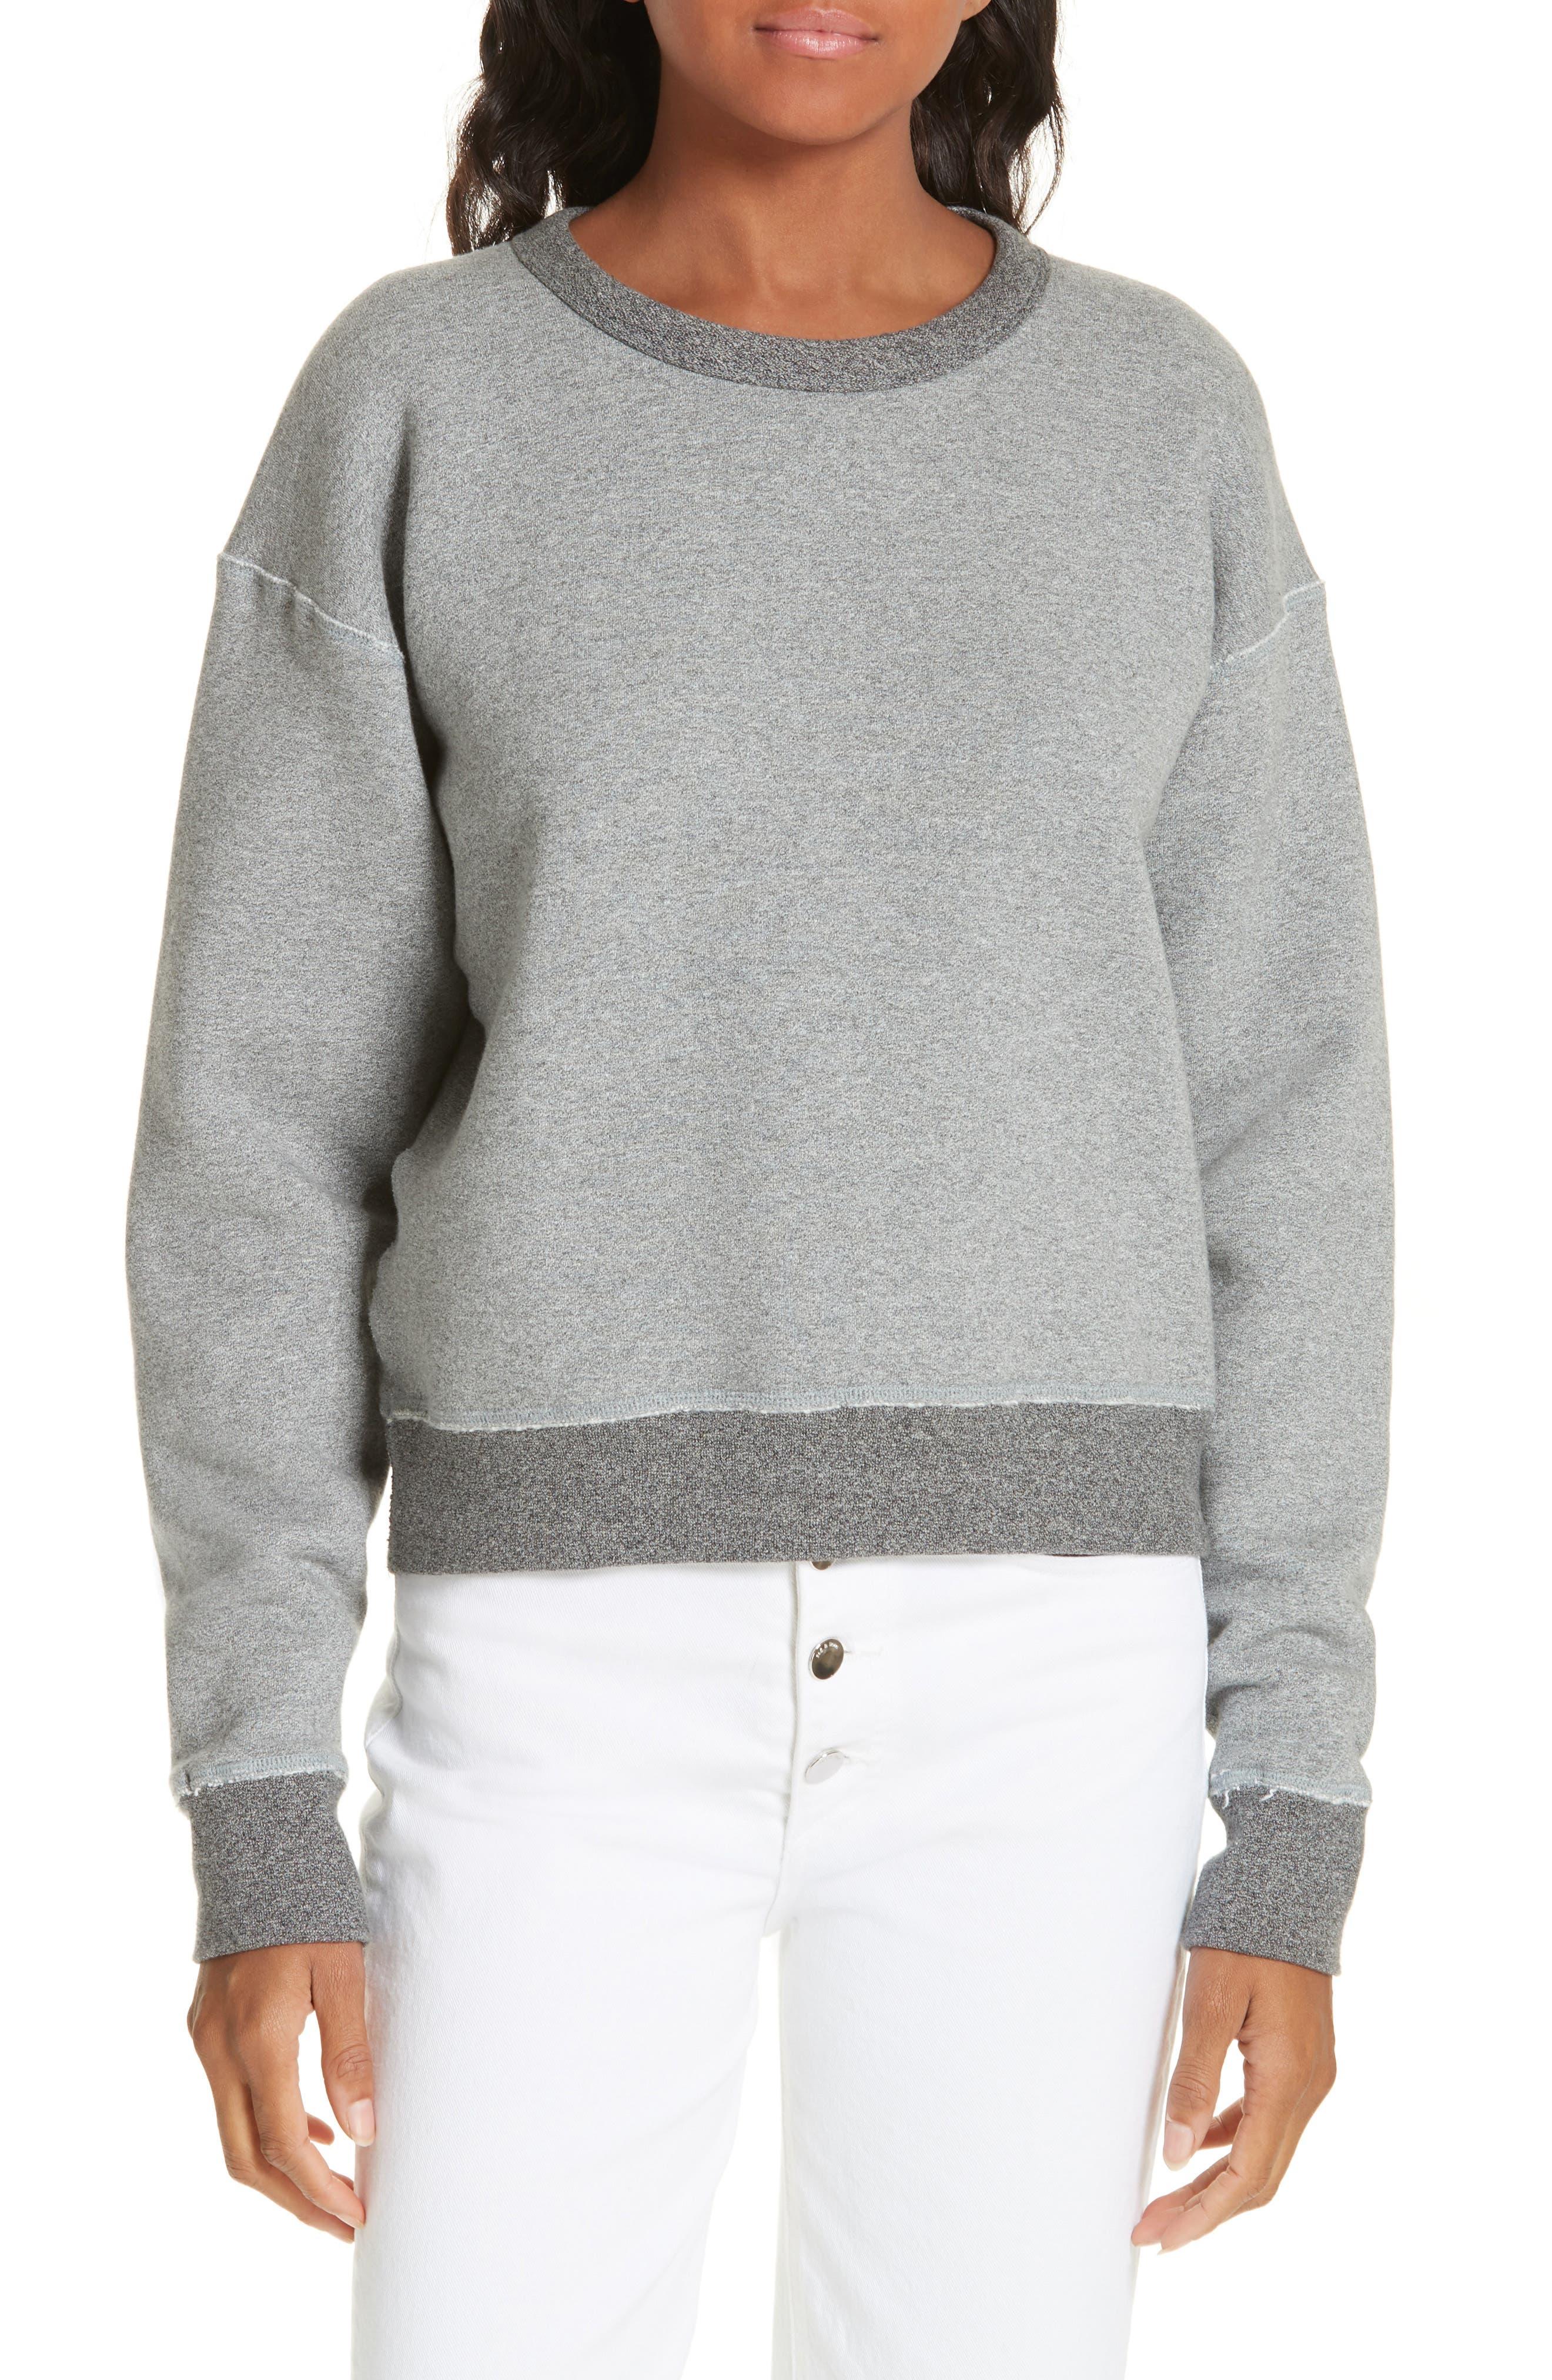 rag & bone Best Sweatshirt,                             Main thumbnail 1, color,                             HEATHER GREY